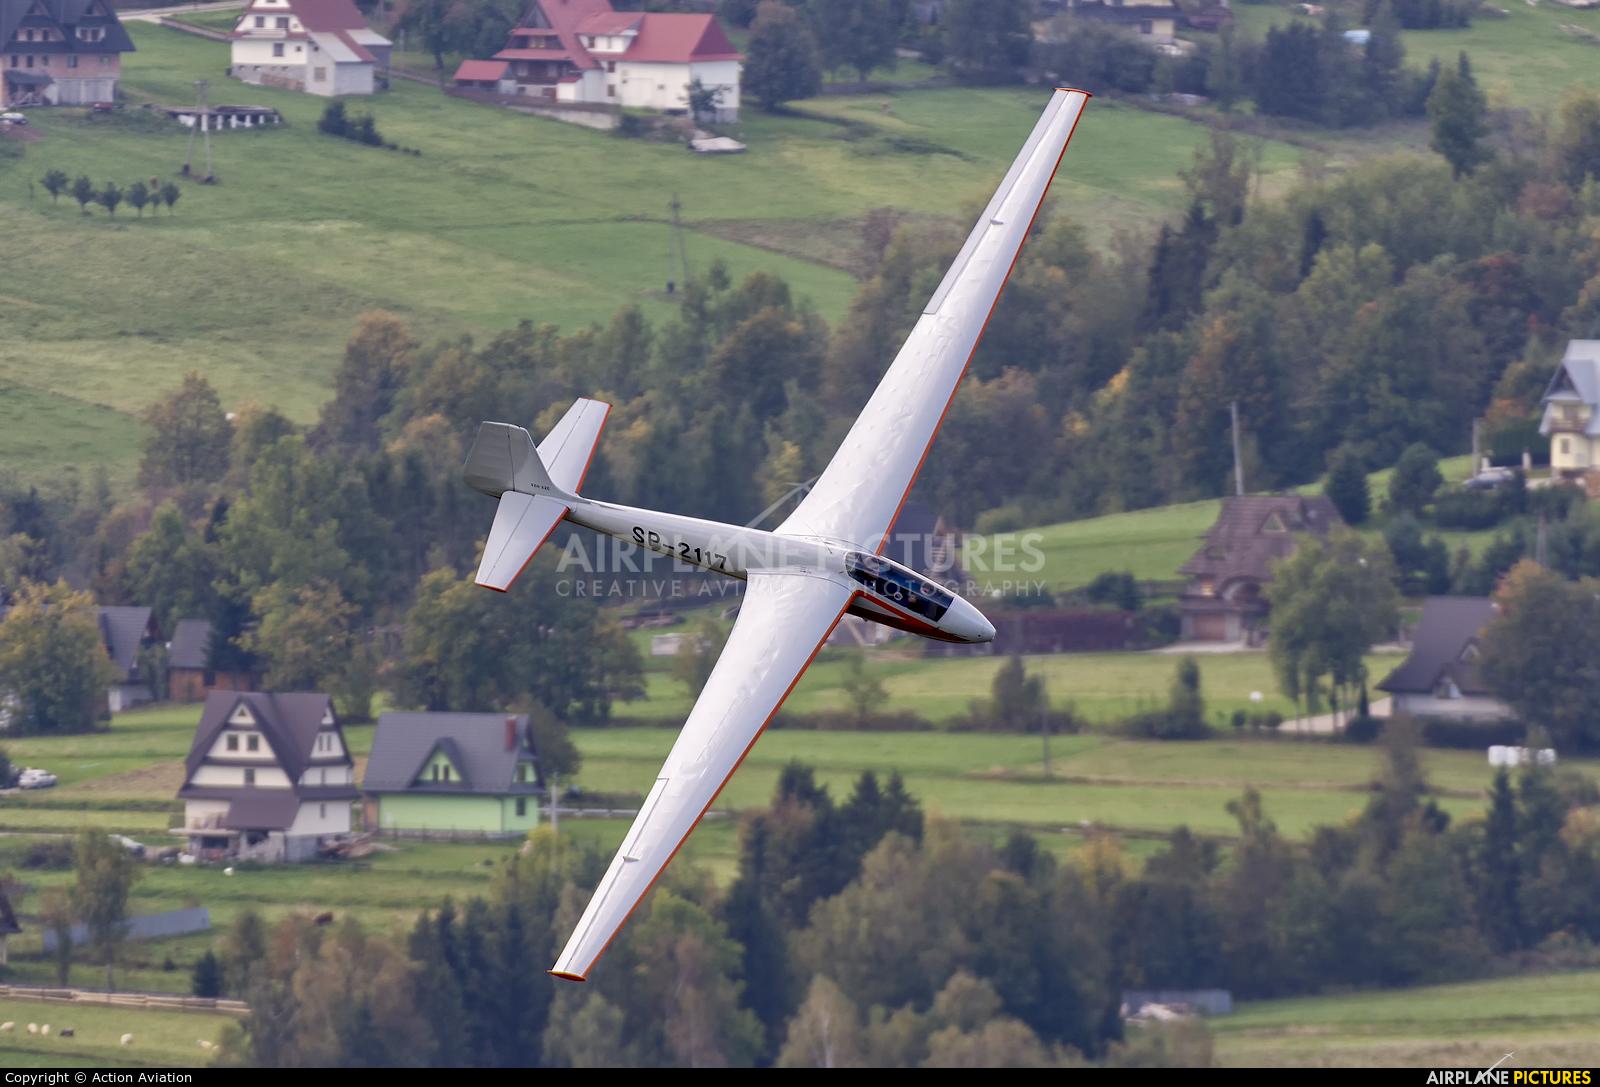 Aeroklub Nowy Targ SP-2117 aircraft at Off Airport - Poland